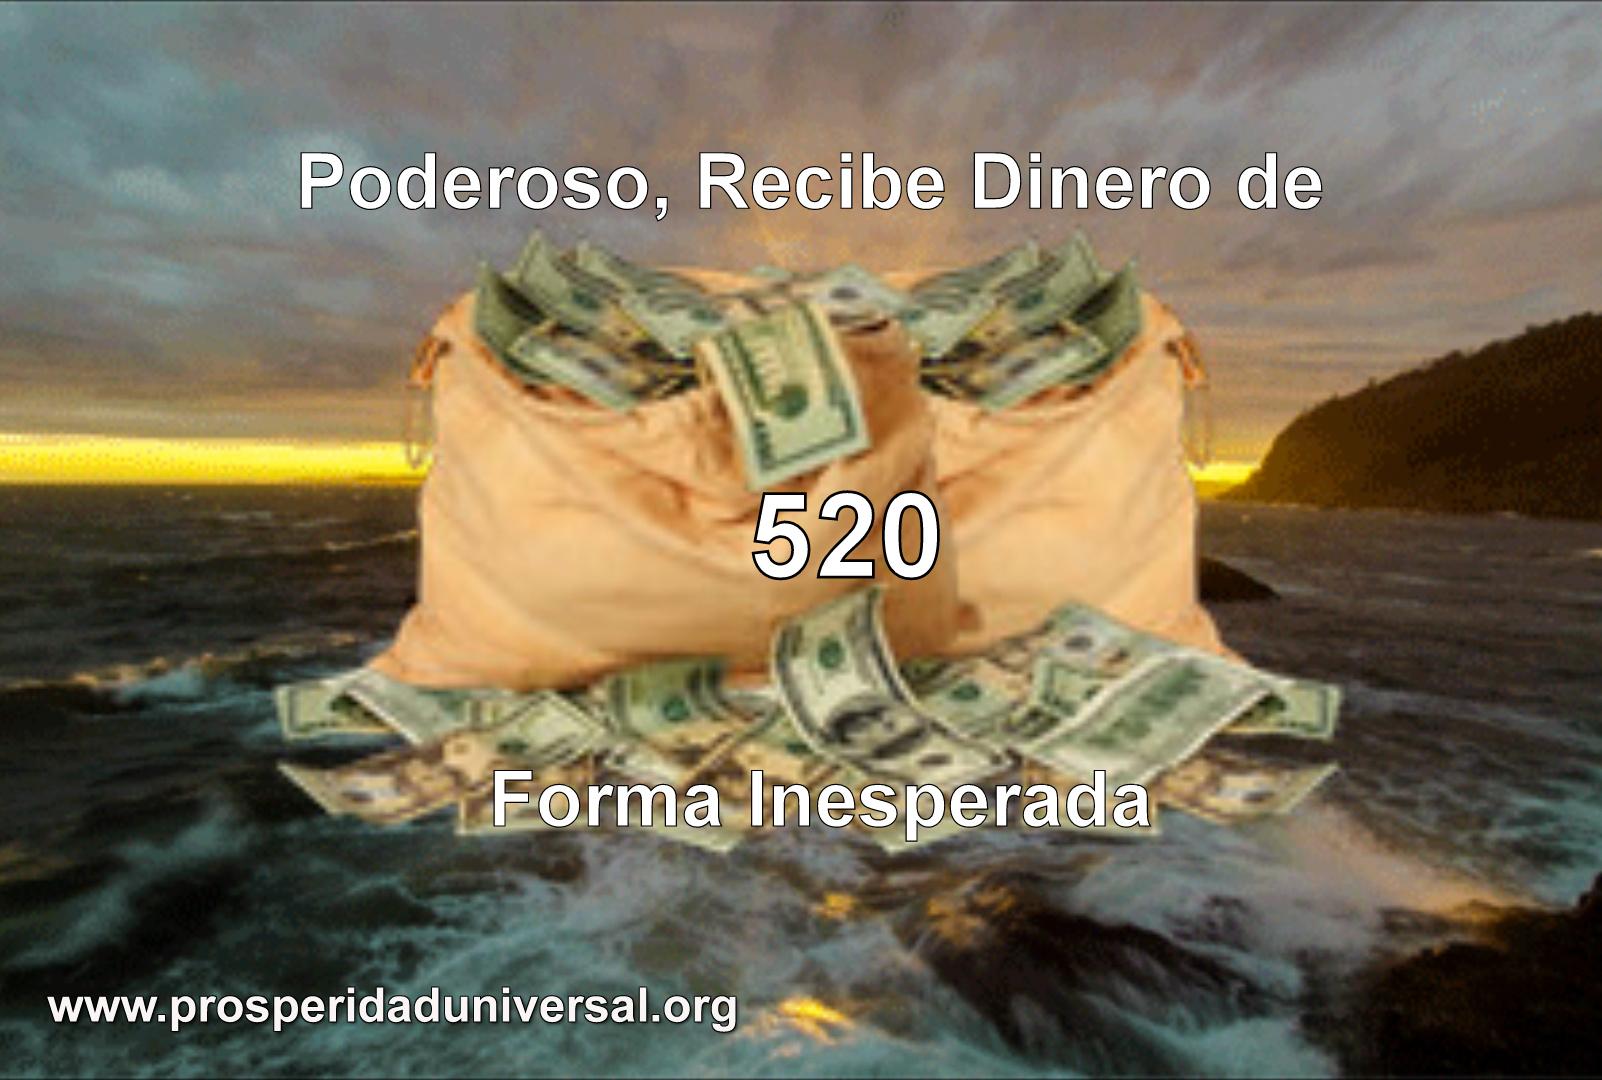 PODEROSO, RECIBE DINERO DE FORMA INESPERADA